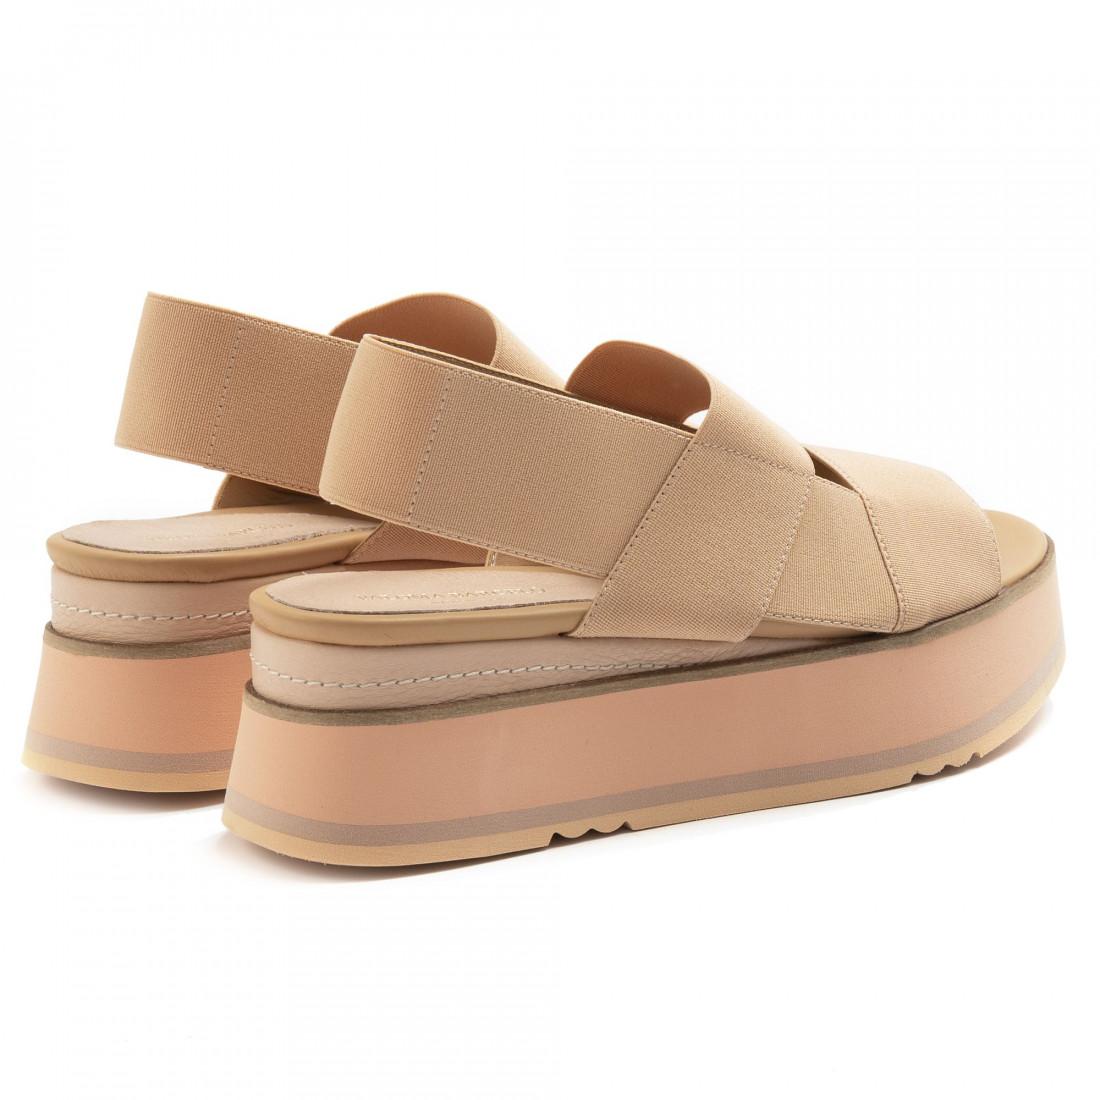 sandals woman paloma barcelo trinidadpink canarias 6892